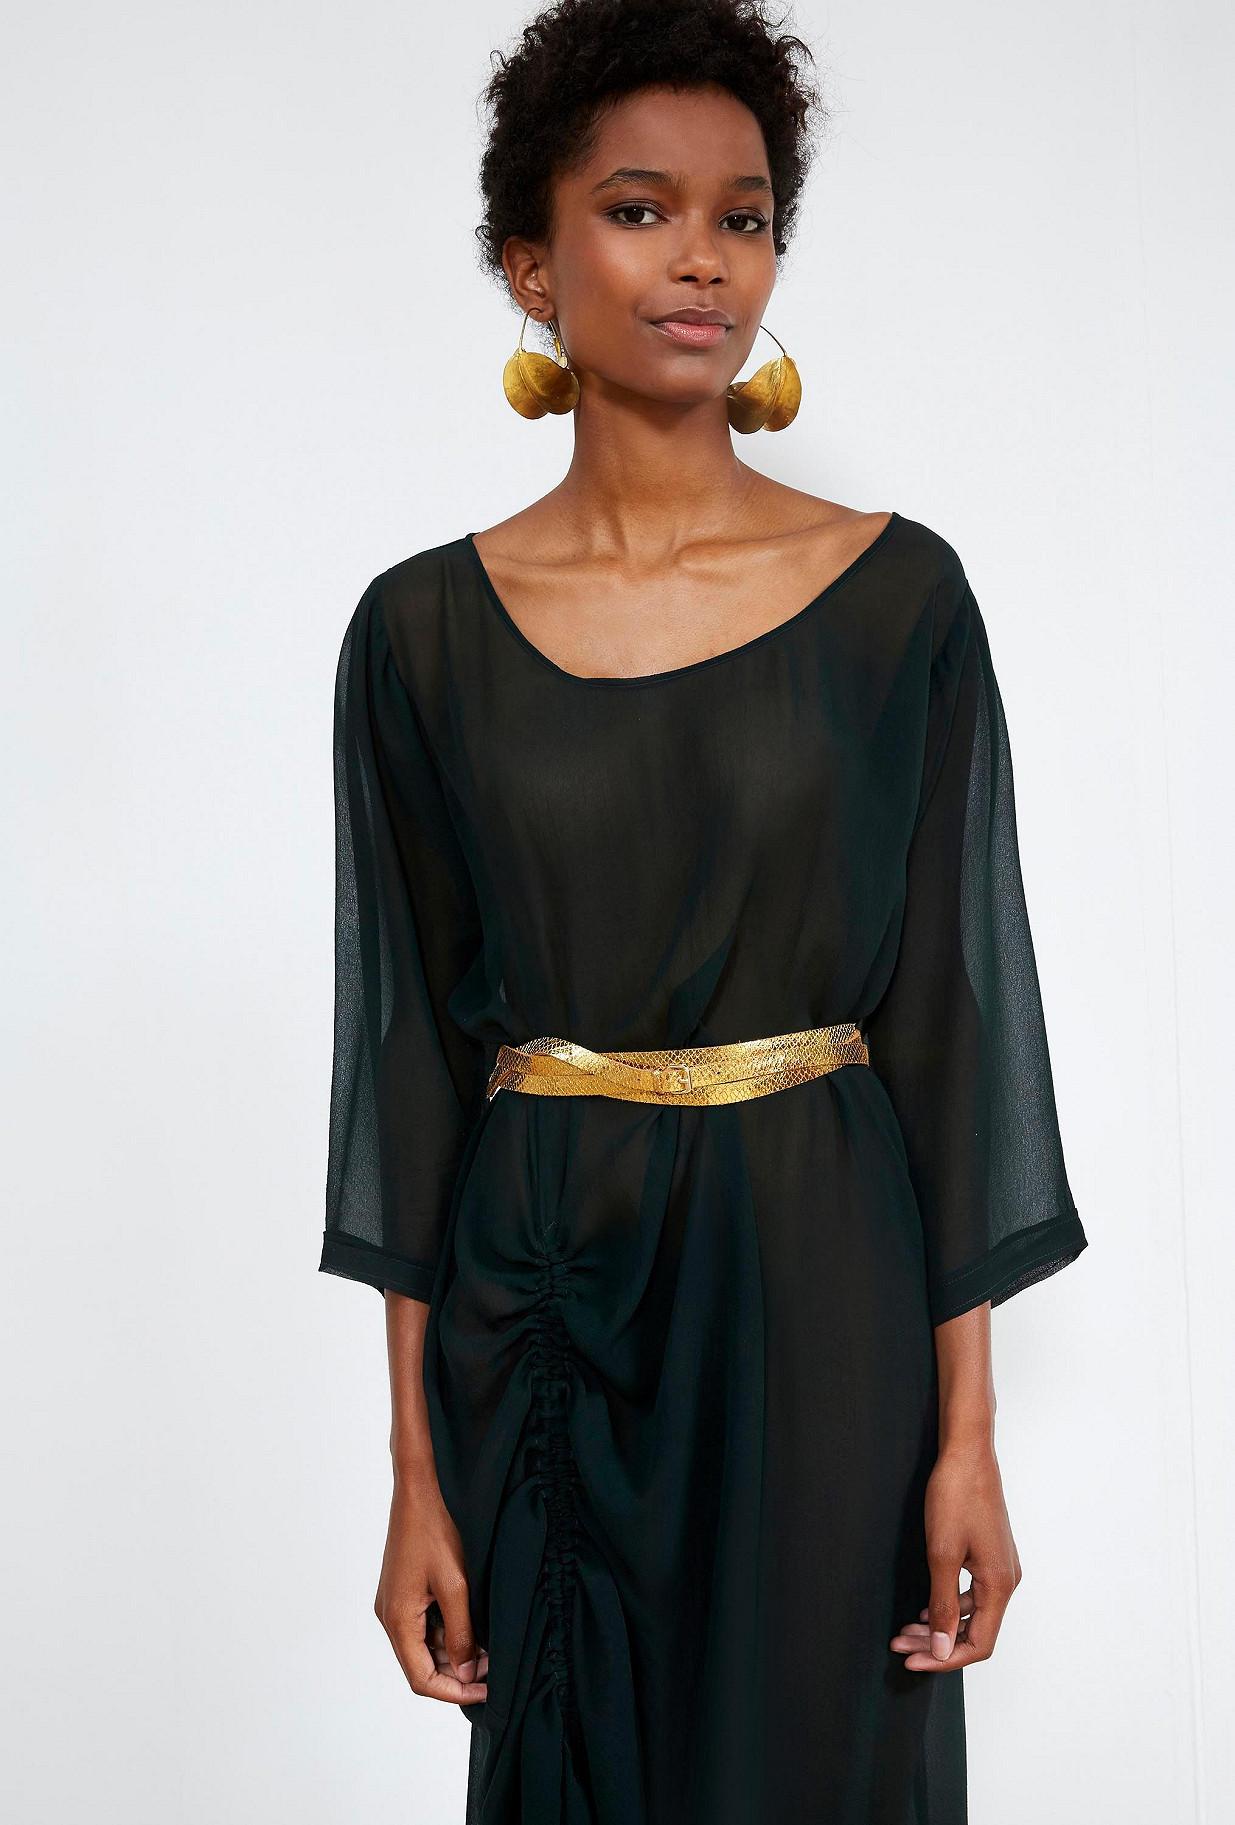 clothes store ACCESSORIES  Vanda french designer fashion Paris